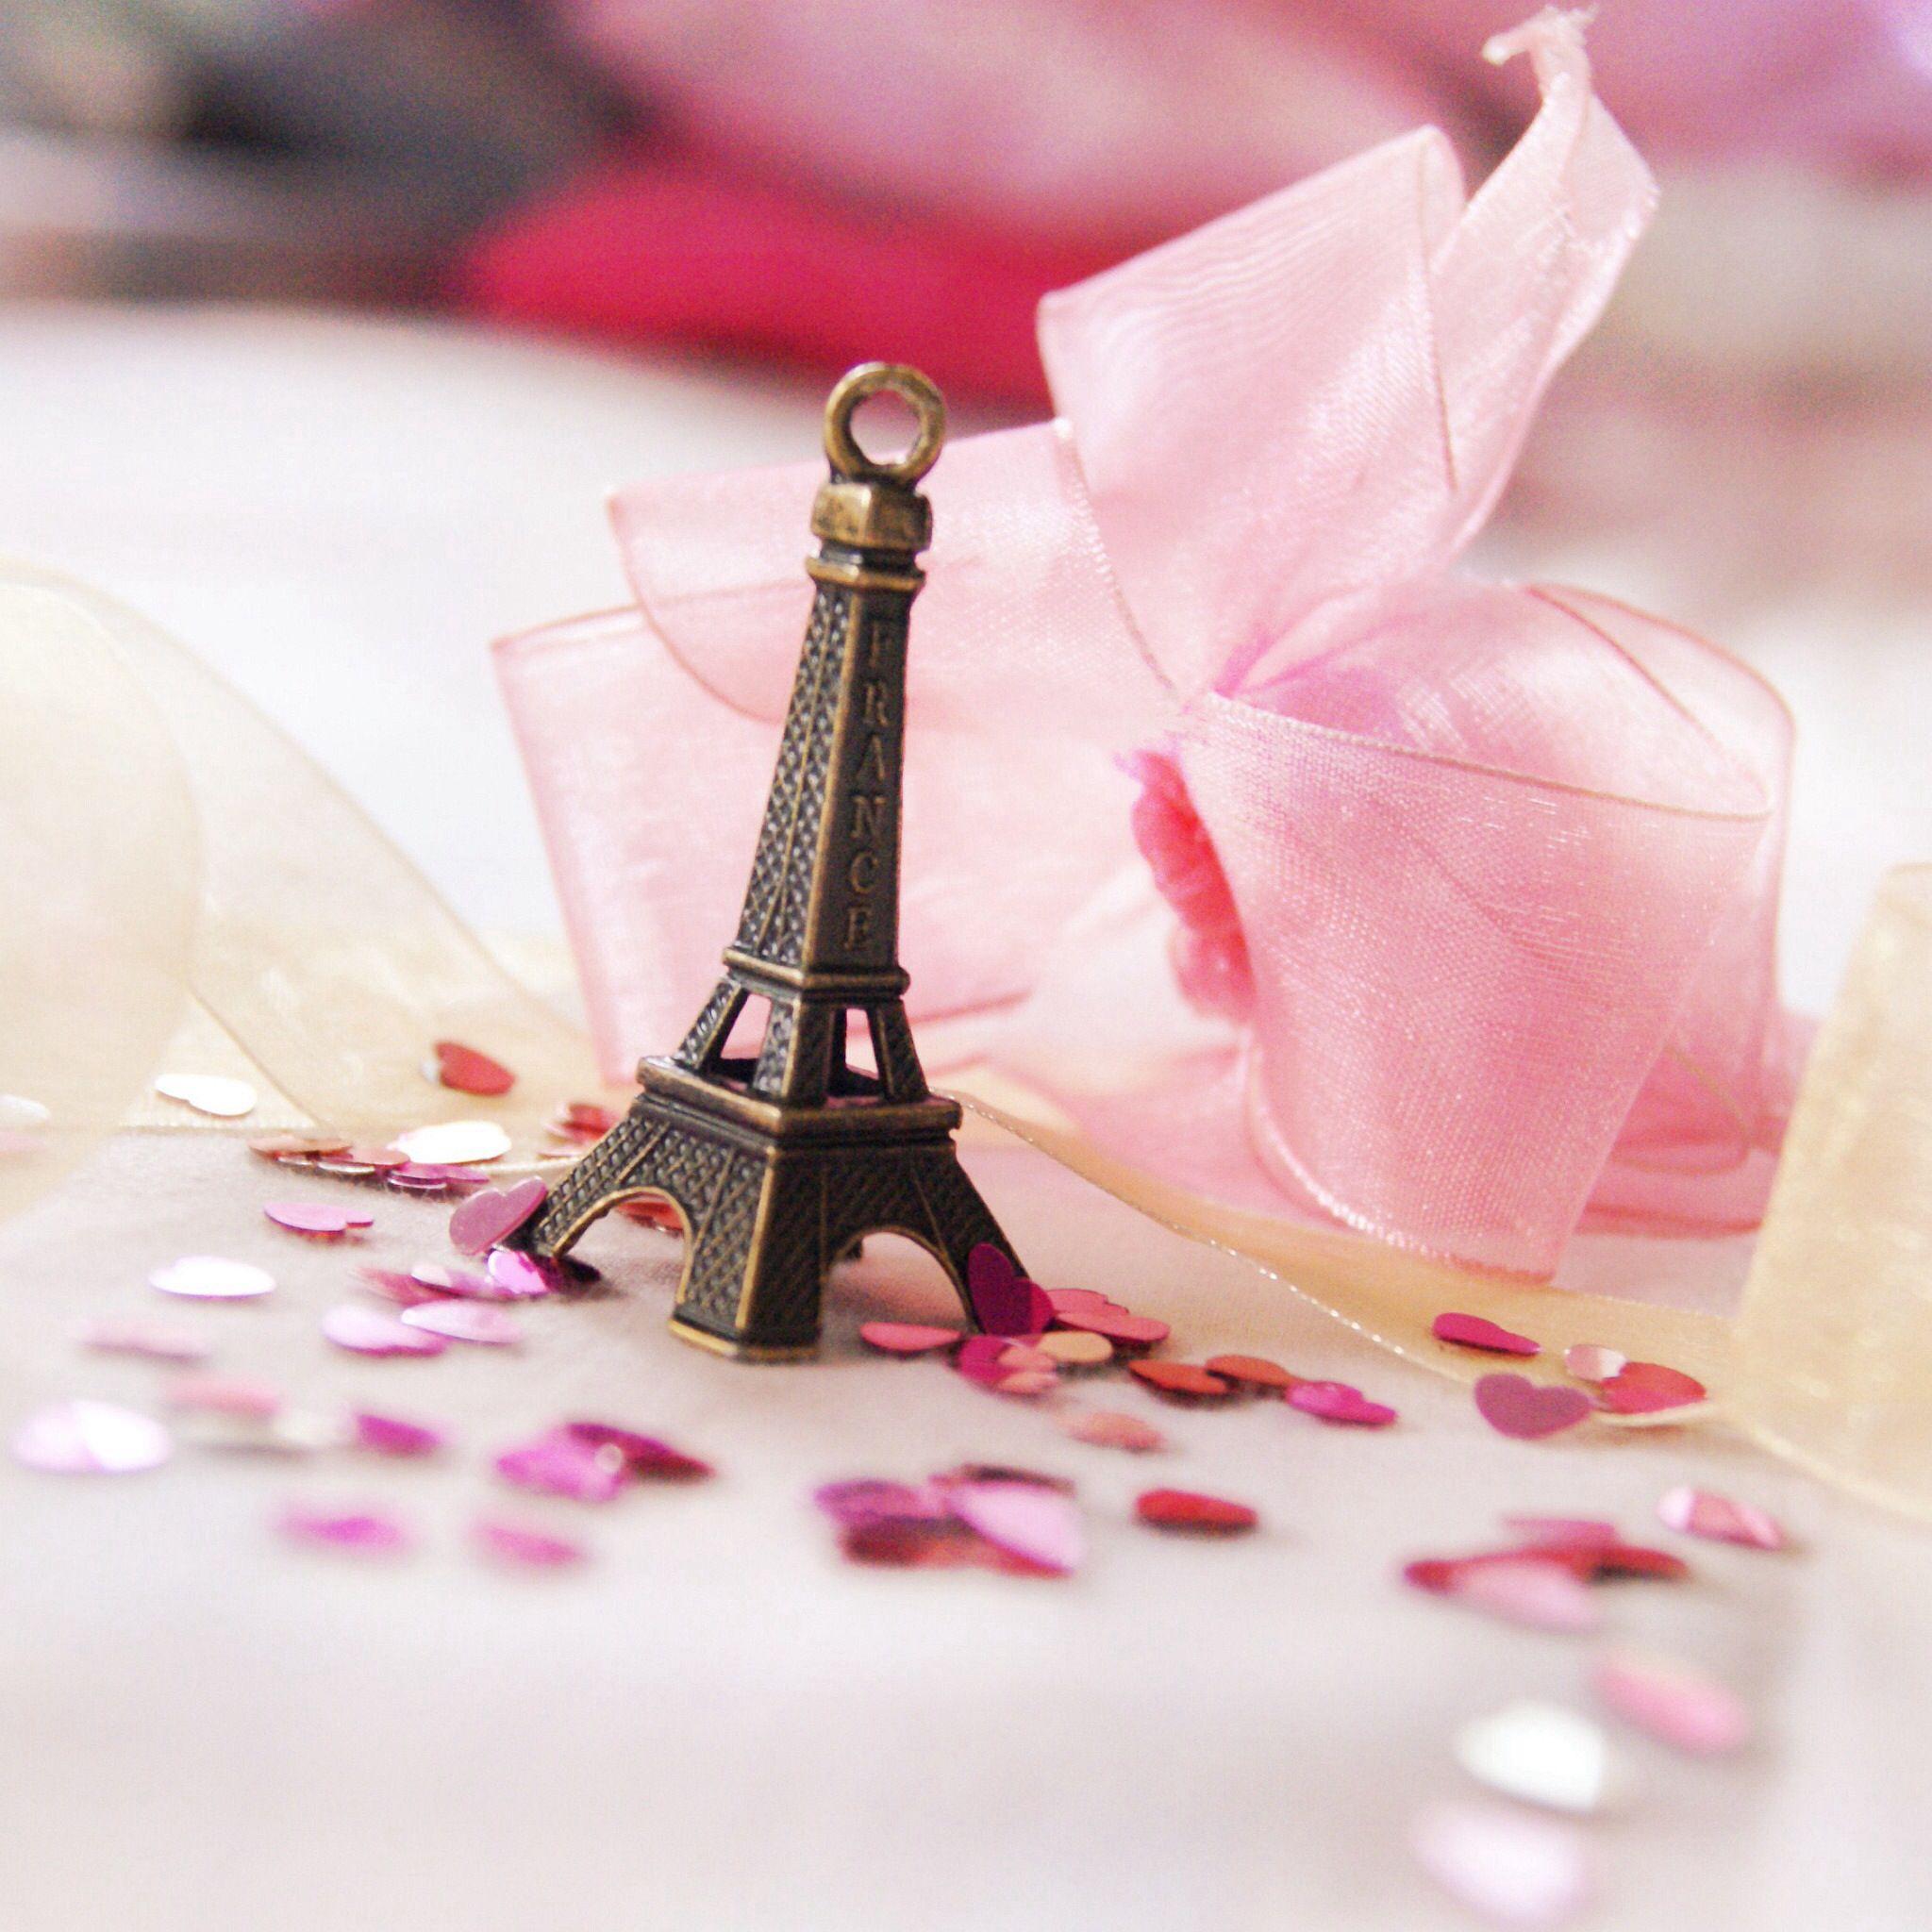 Paris Pink Cute Eiffel Tower Fondos De Pantalla Flores La Torre De Paris Imagenes De Fondo